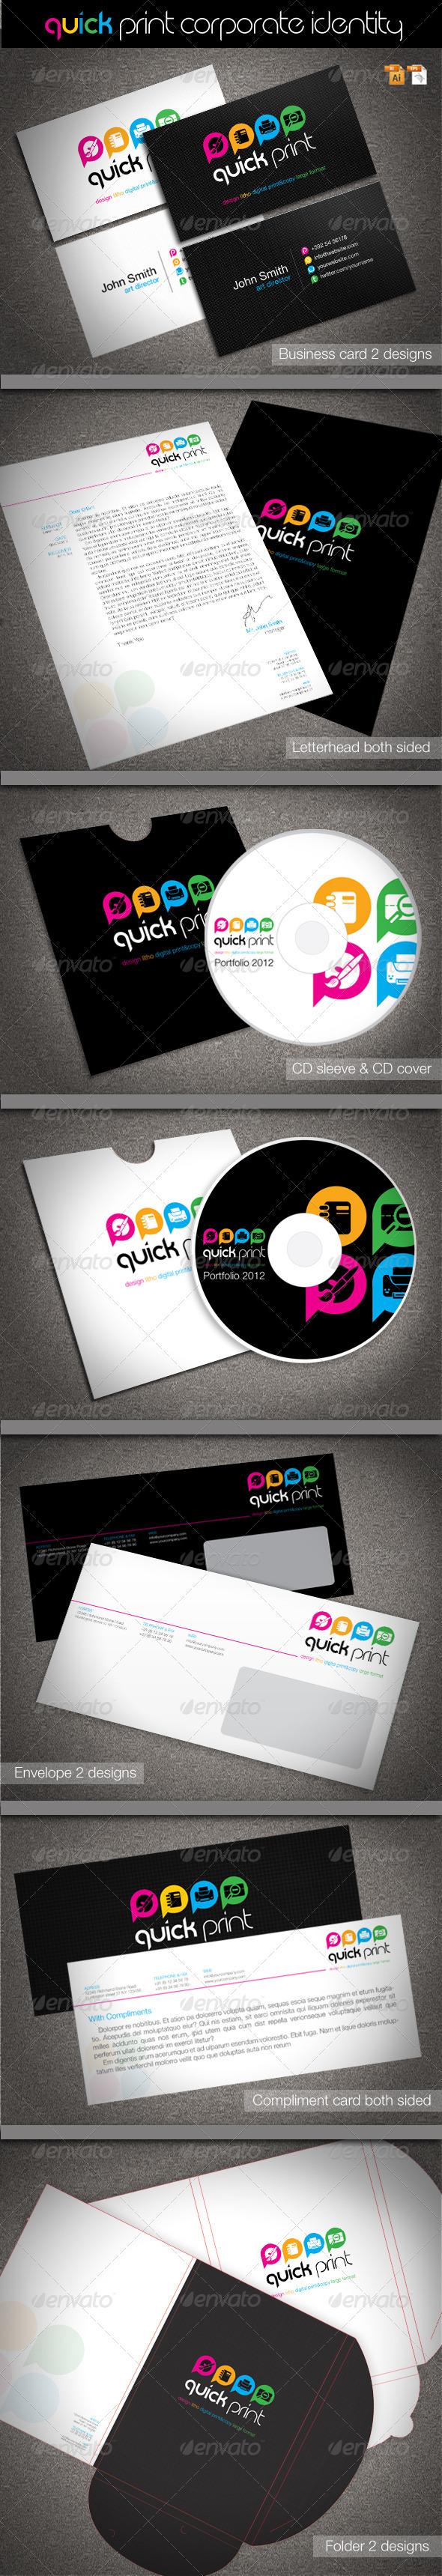 Quick Print Corporate Identity